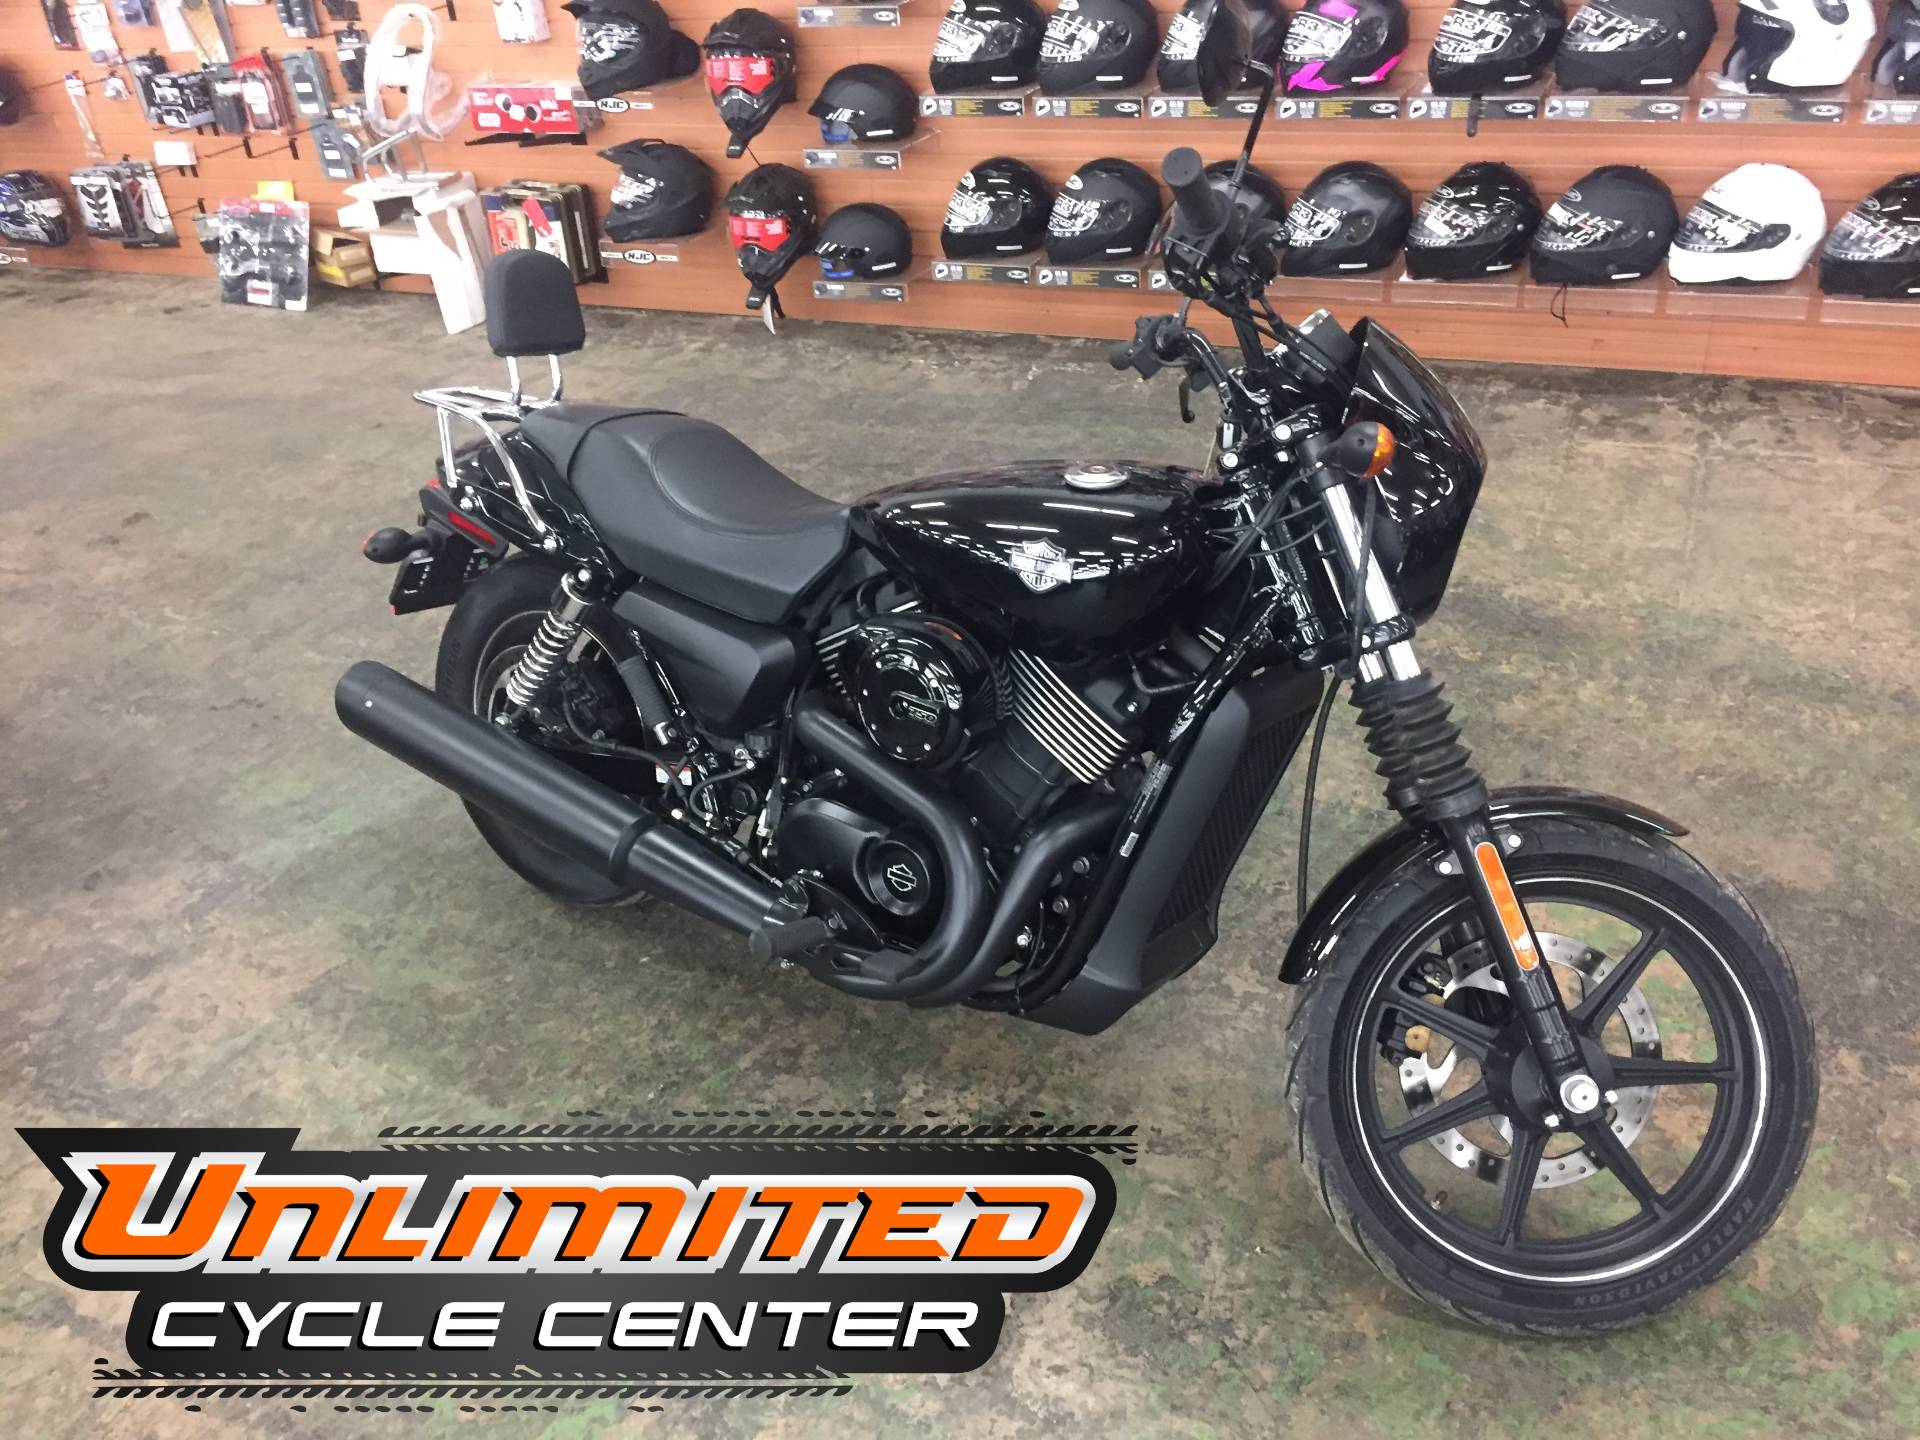 2016 Harley Davidson Street 750 In Tyrone Pennsylvania Photo 1